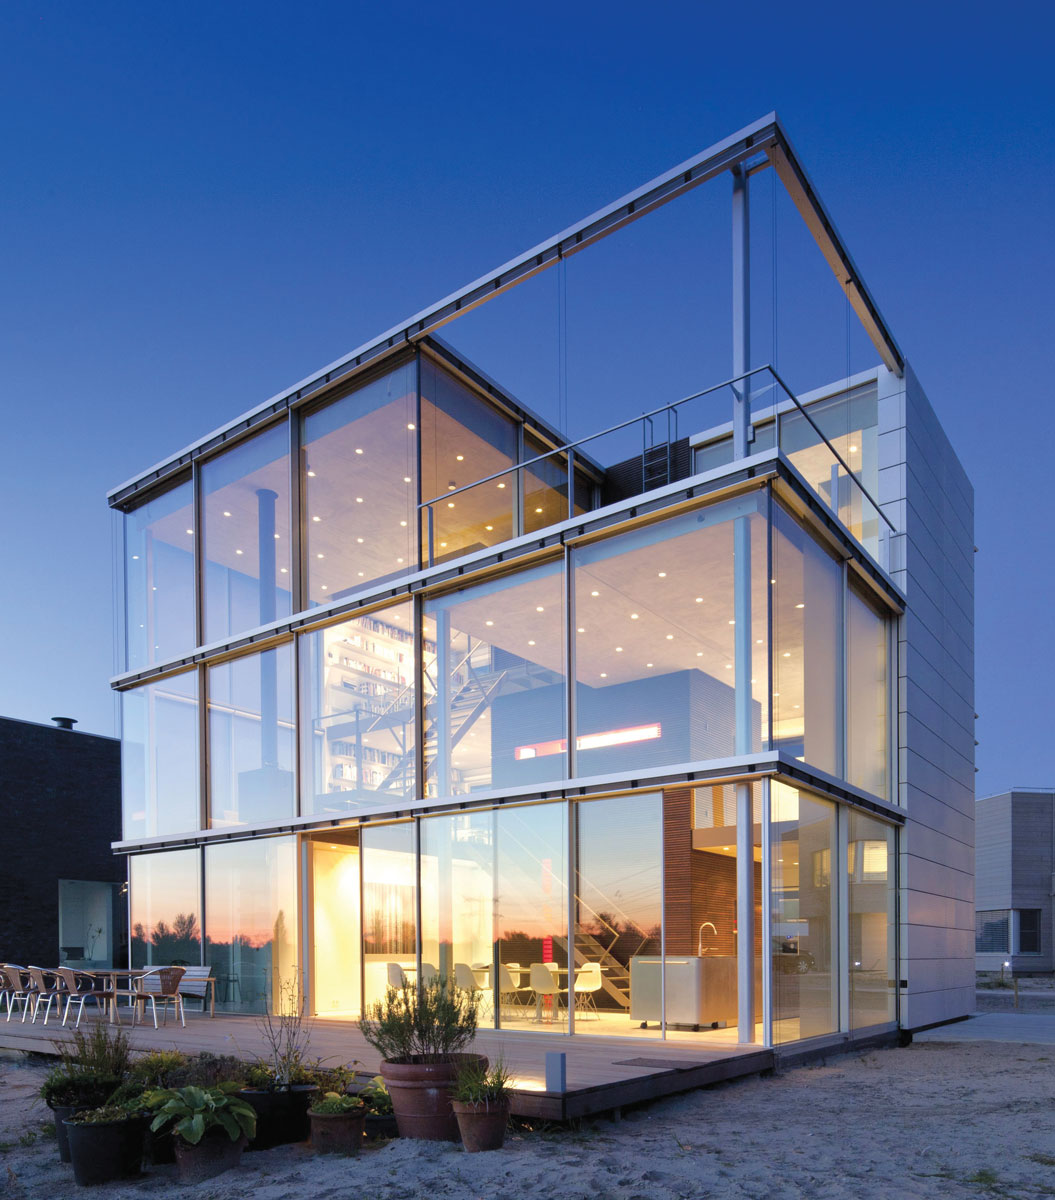 Moderna arhitektura, aluminijum